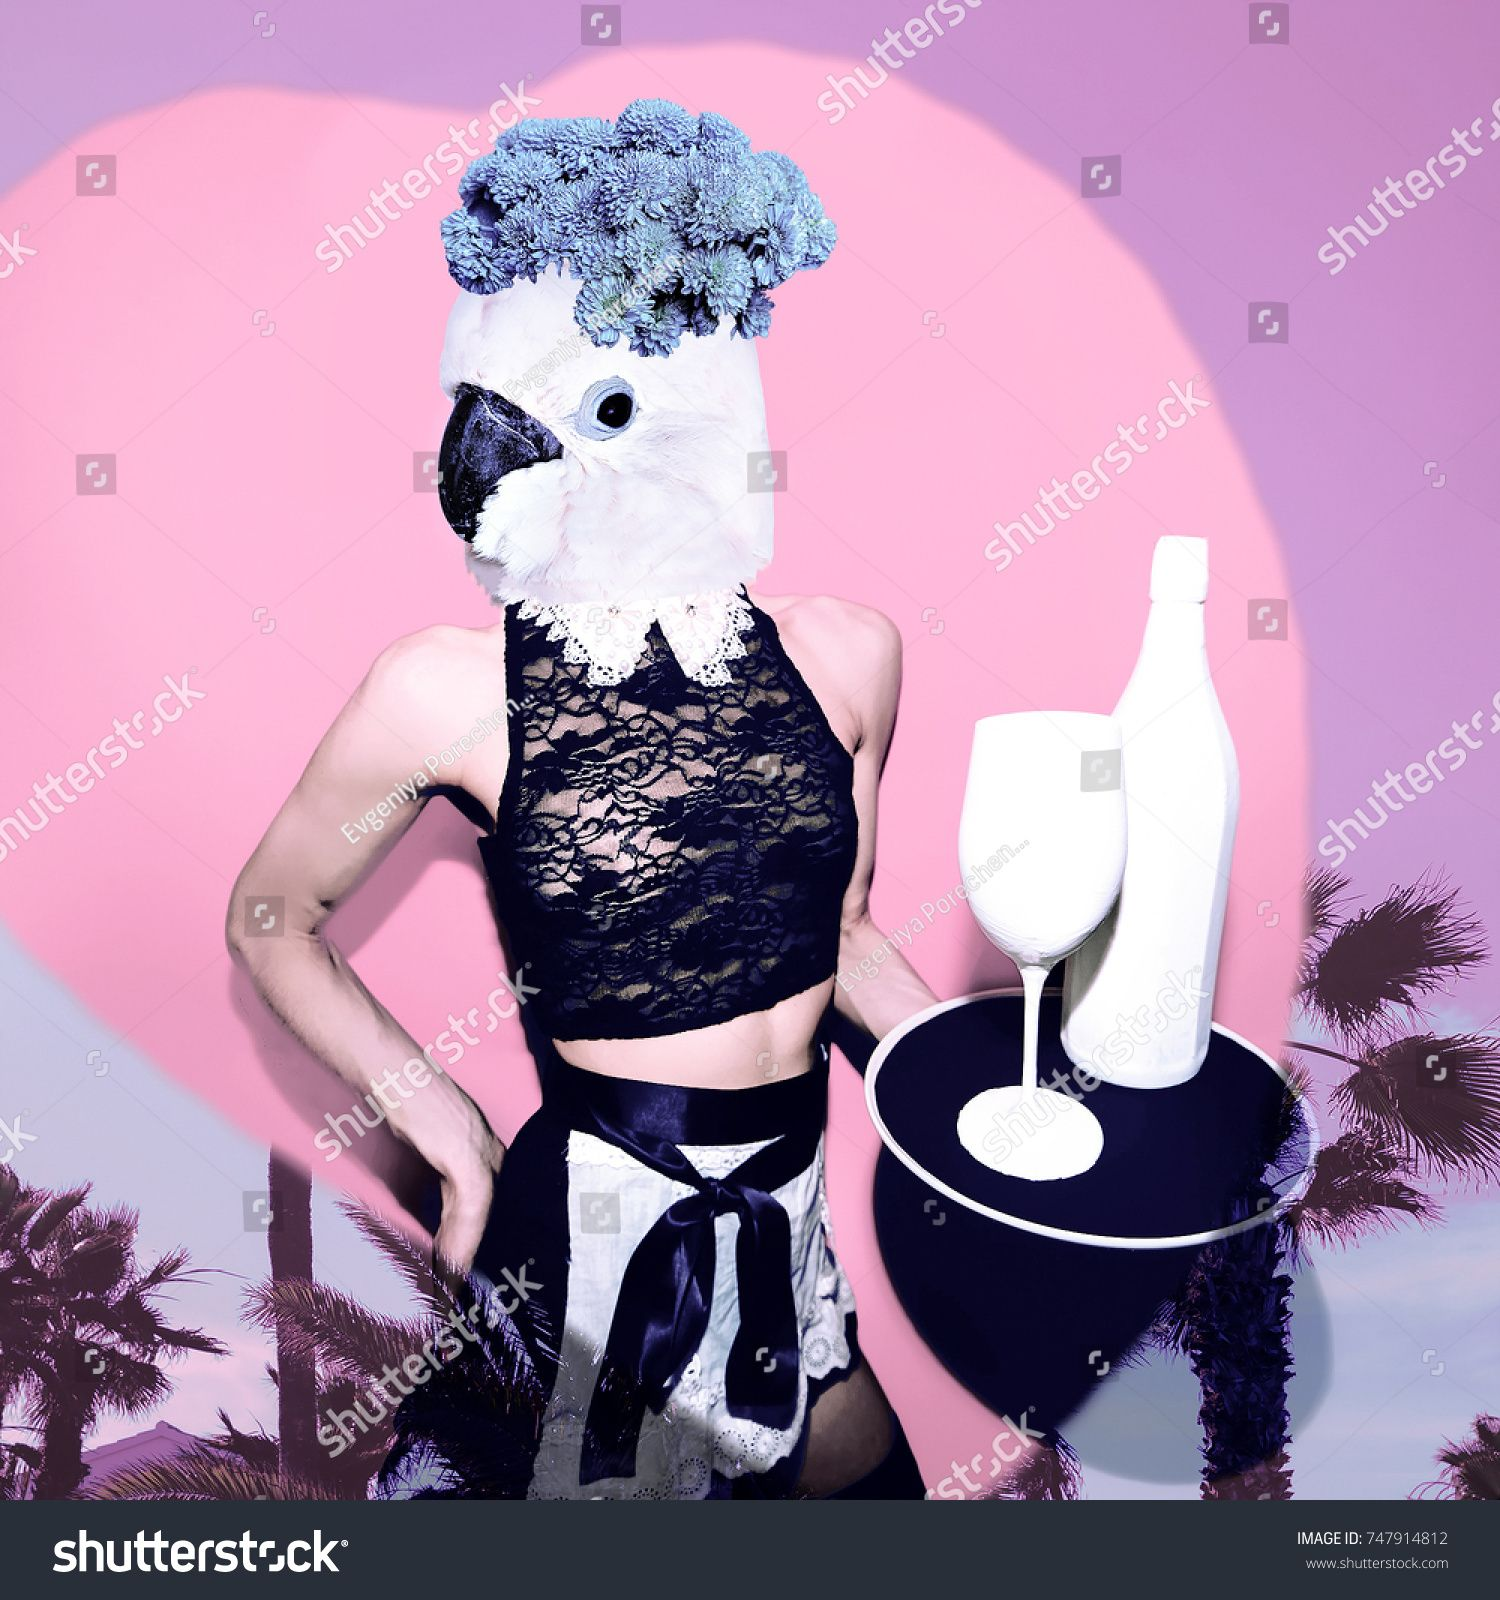 Contemporary art collage. Tropical parrot waitress. Concept my unicorn life ,